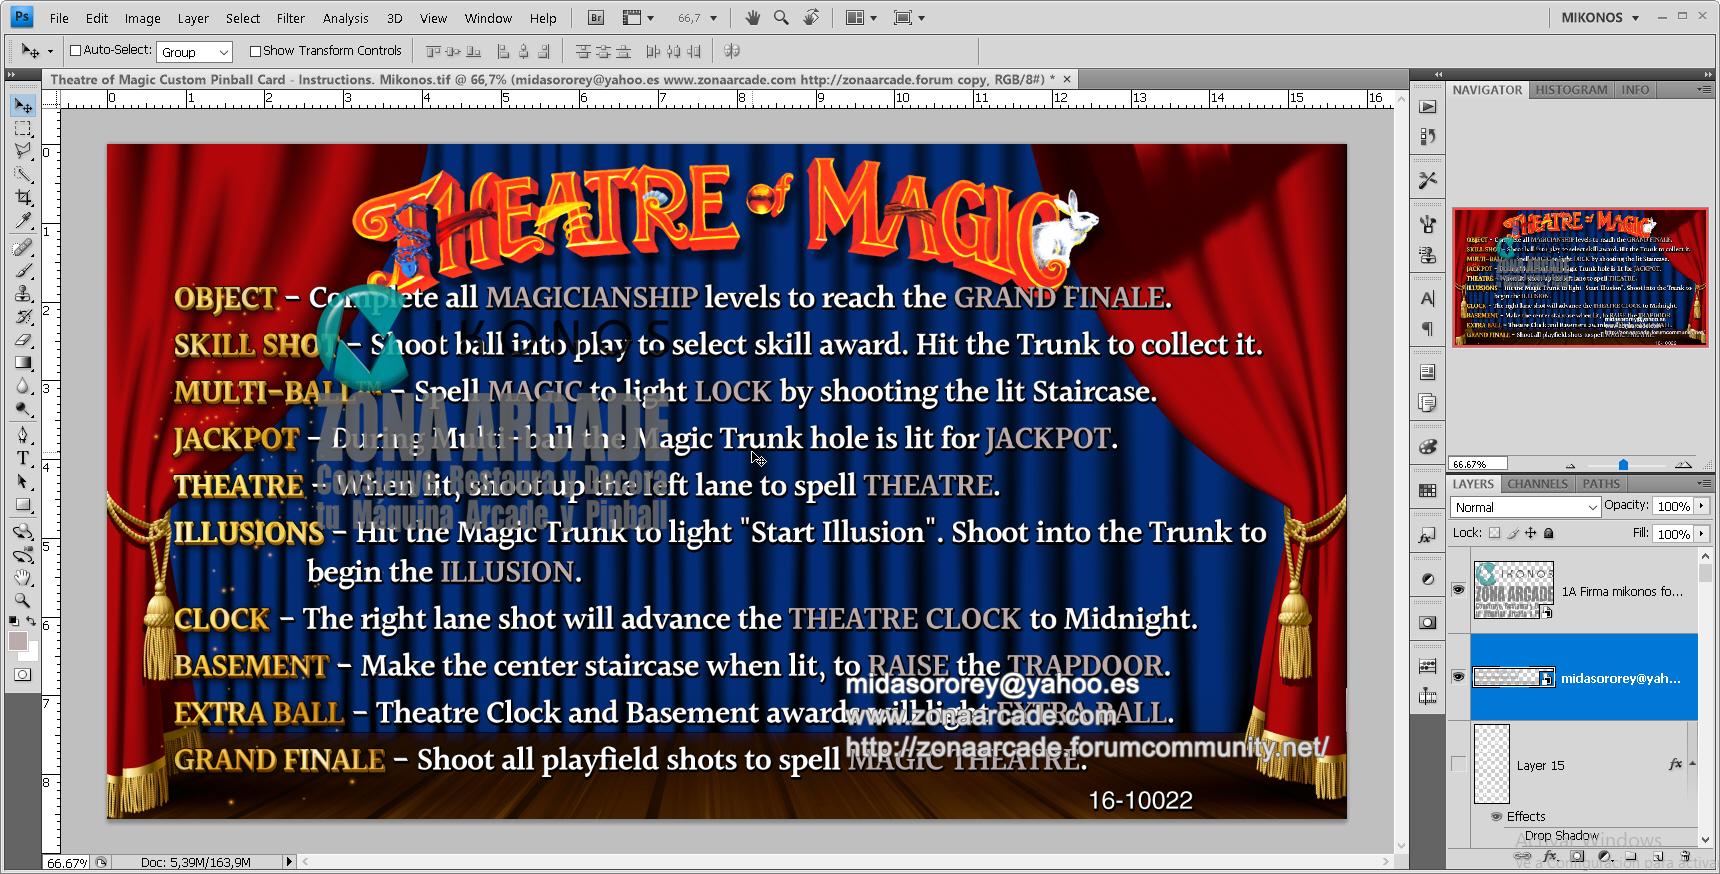 Theatre%20Of%20Magic%20Custom%20Pinball%20Cards%20-%20Instructions.%20Mikonos1.jpg